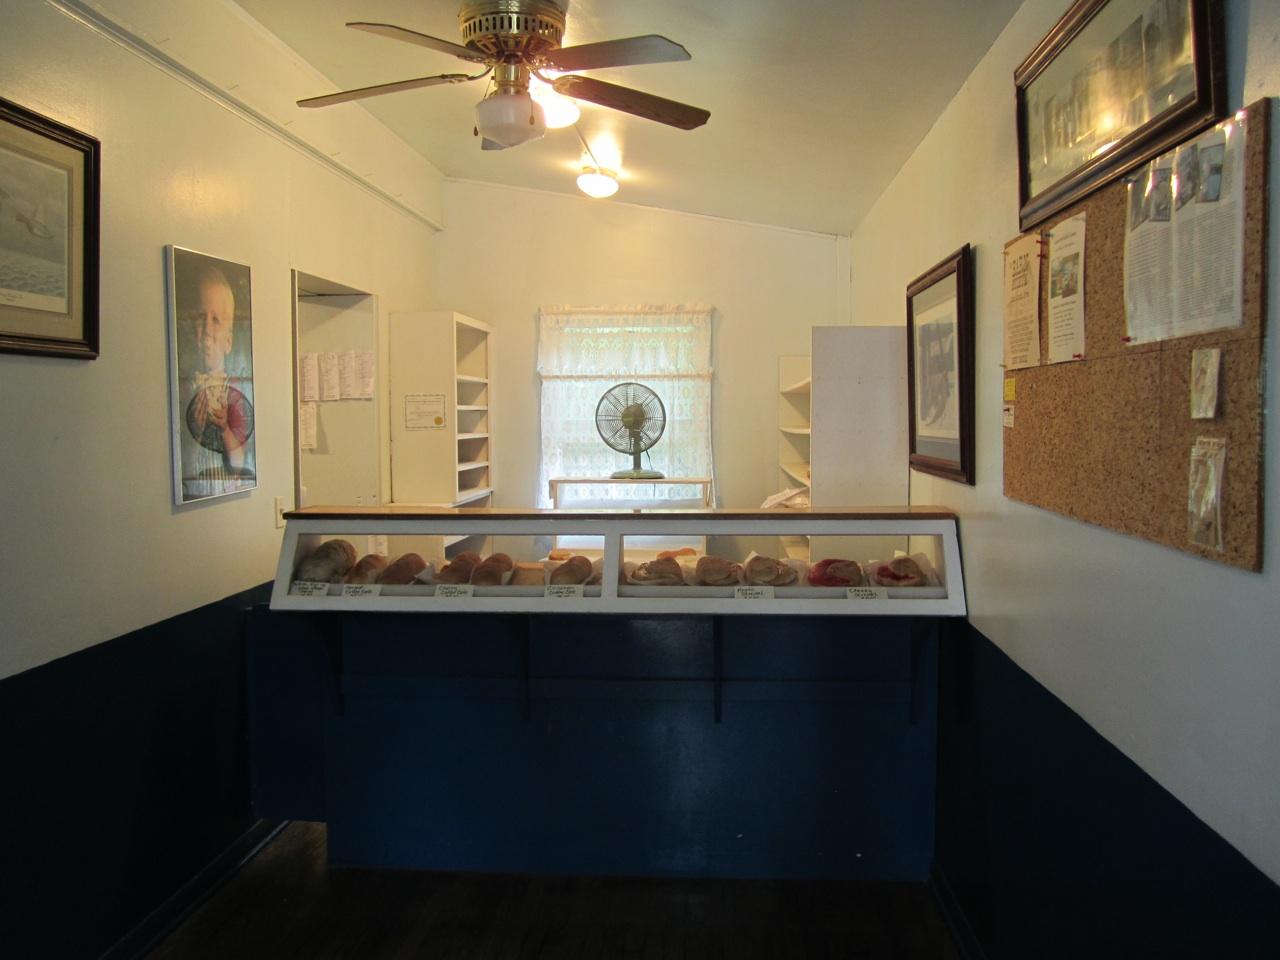 The Counter Inside Hahn's Bakery.